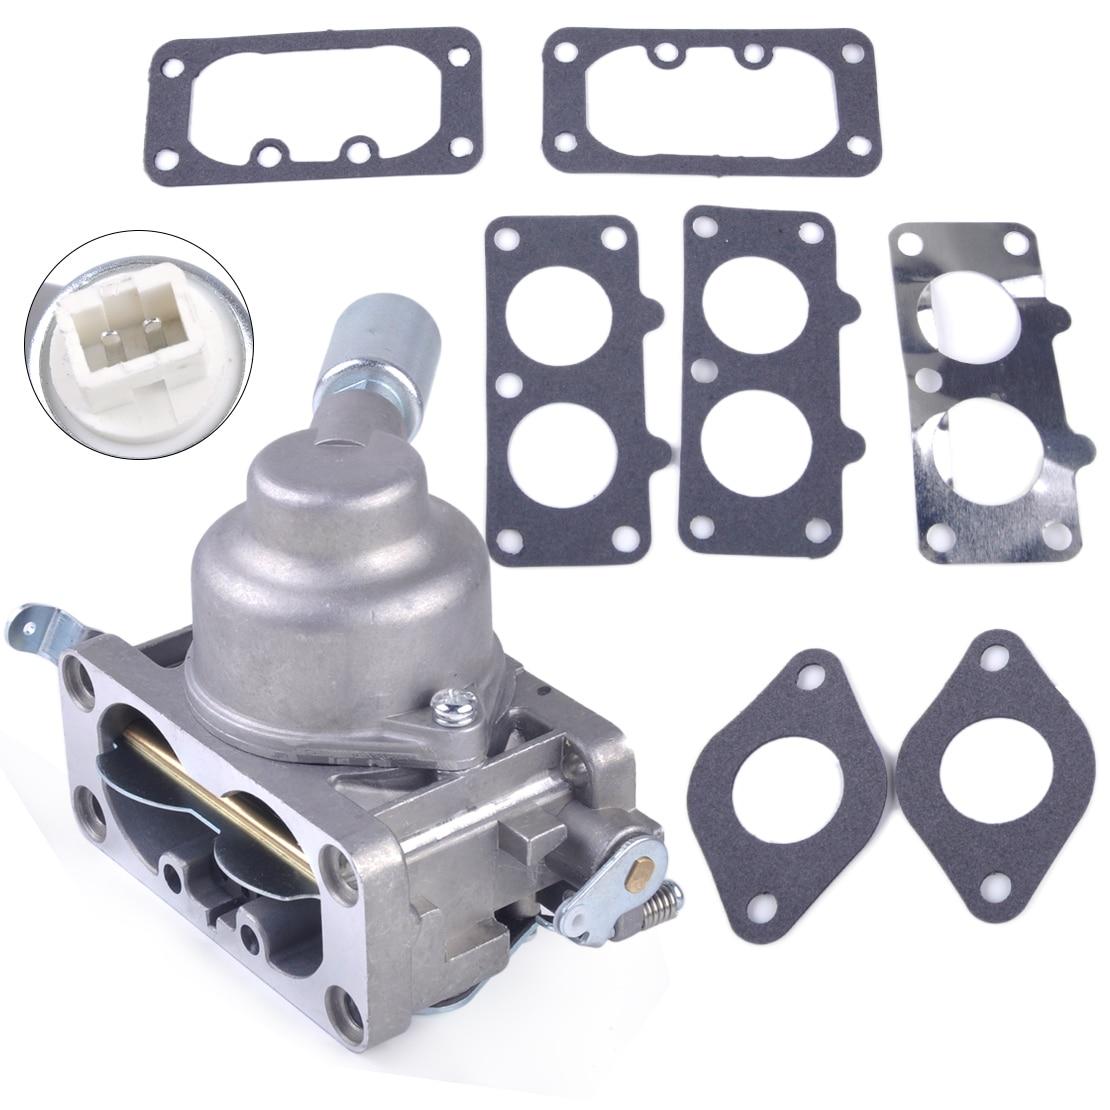 цена на LETAOSK Carburetor Replaces fit for Briggs & Stratton 791230 699709 499804 Manual Choke